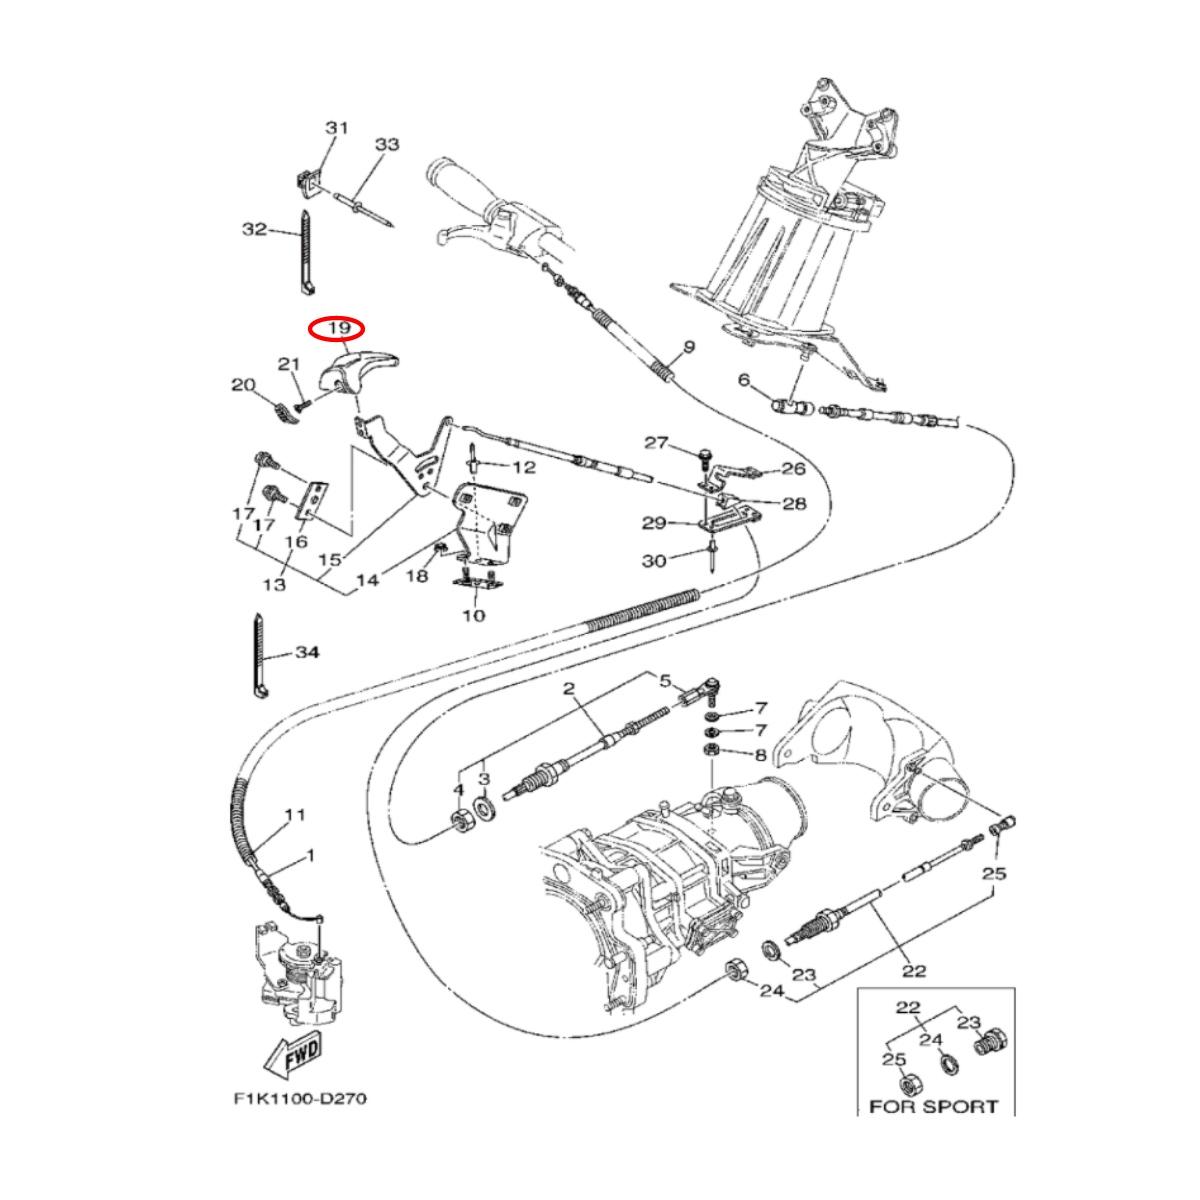 Alavanca Reverso para Yamaha Jet Ski VX 700/110  - Radical Peças - Peças para Jet Ski